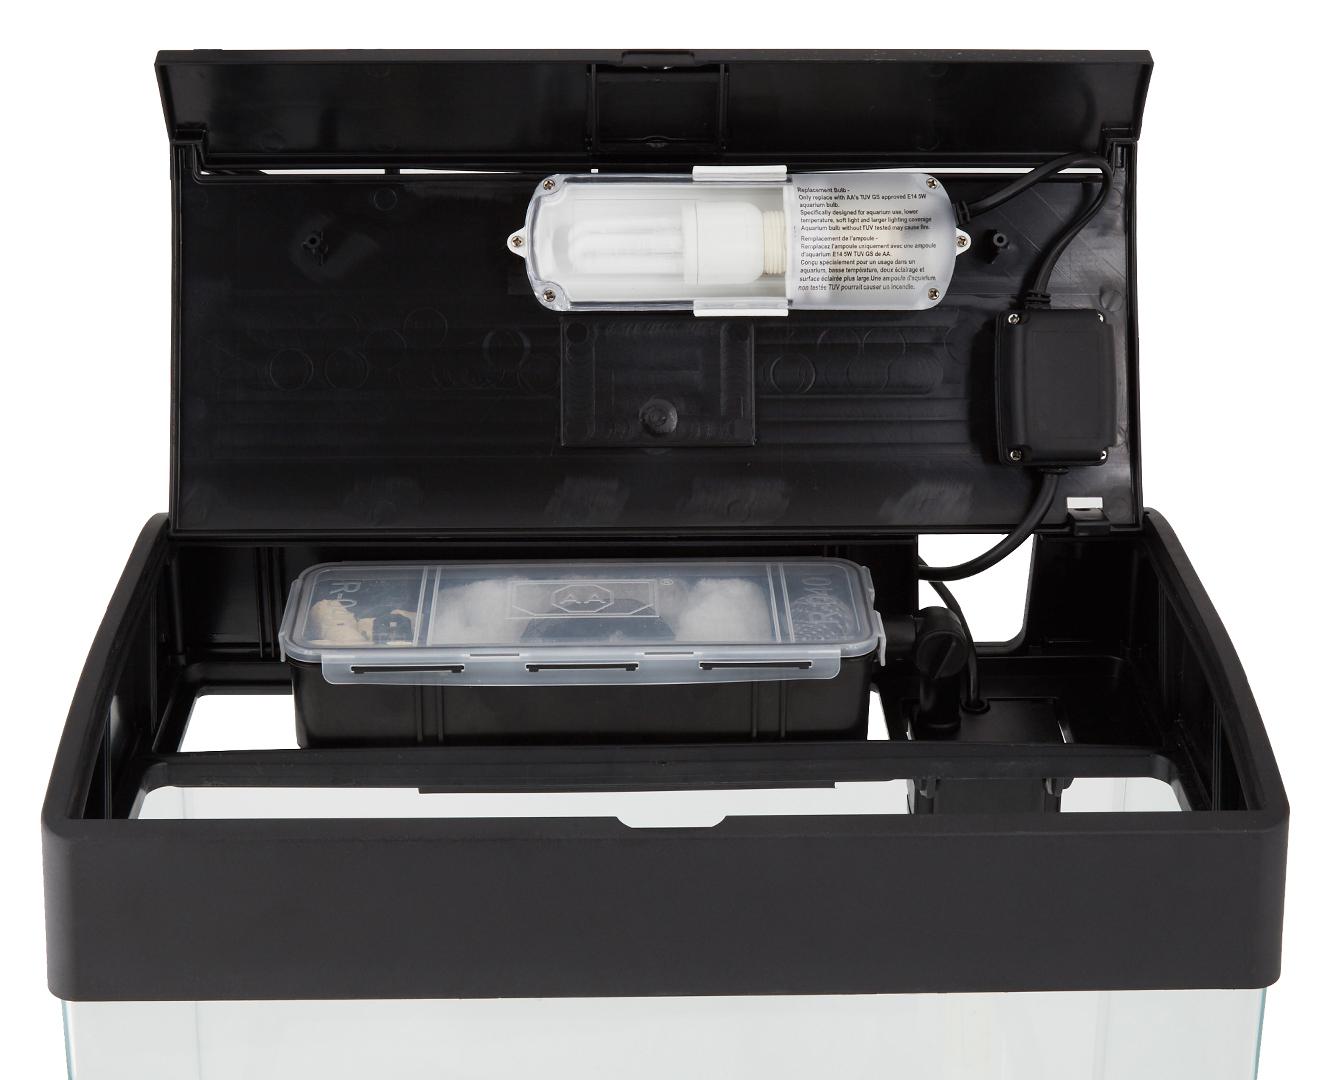 Fish tank zippay - Catchoftheday Com Au Vitapet Ezistart 35l Complete Glass Freshwater Fish Tank Kit